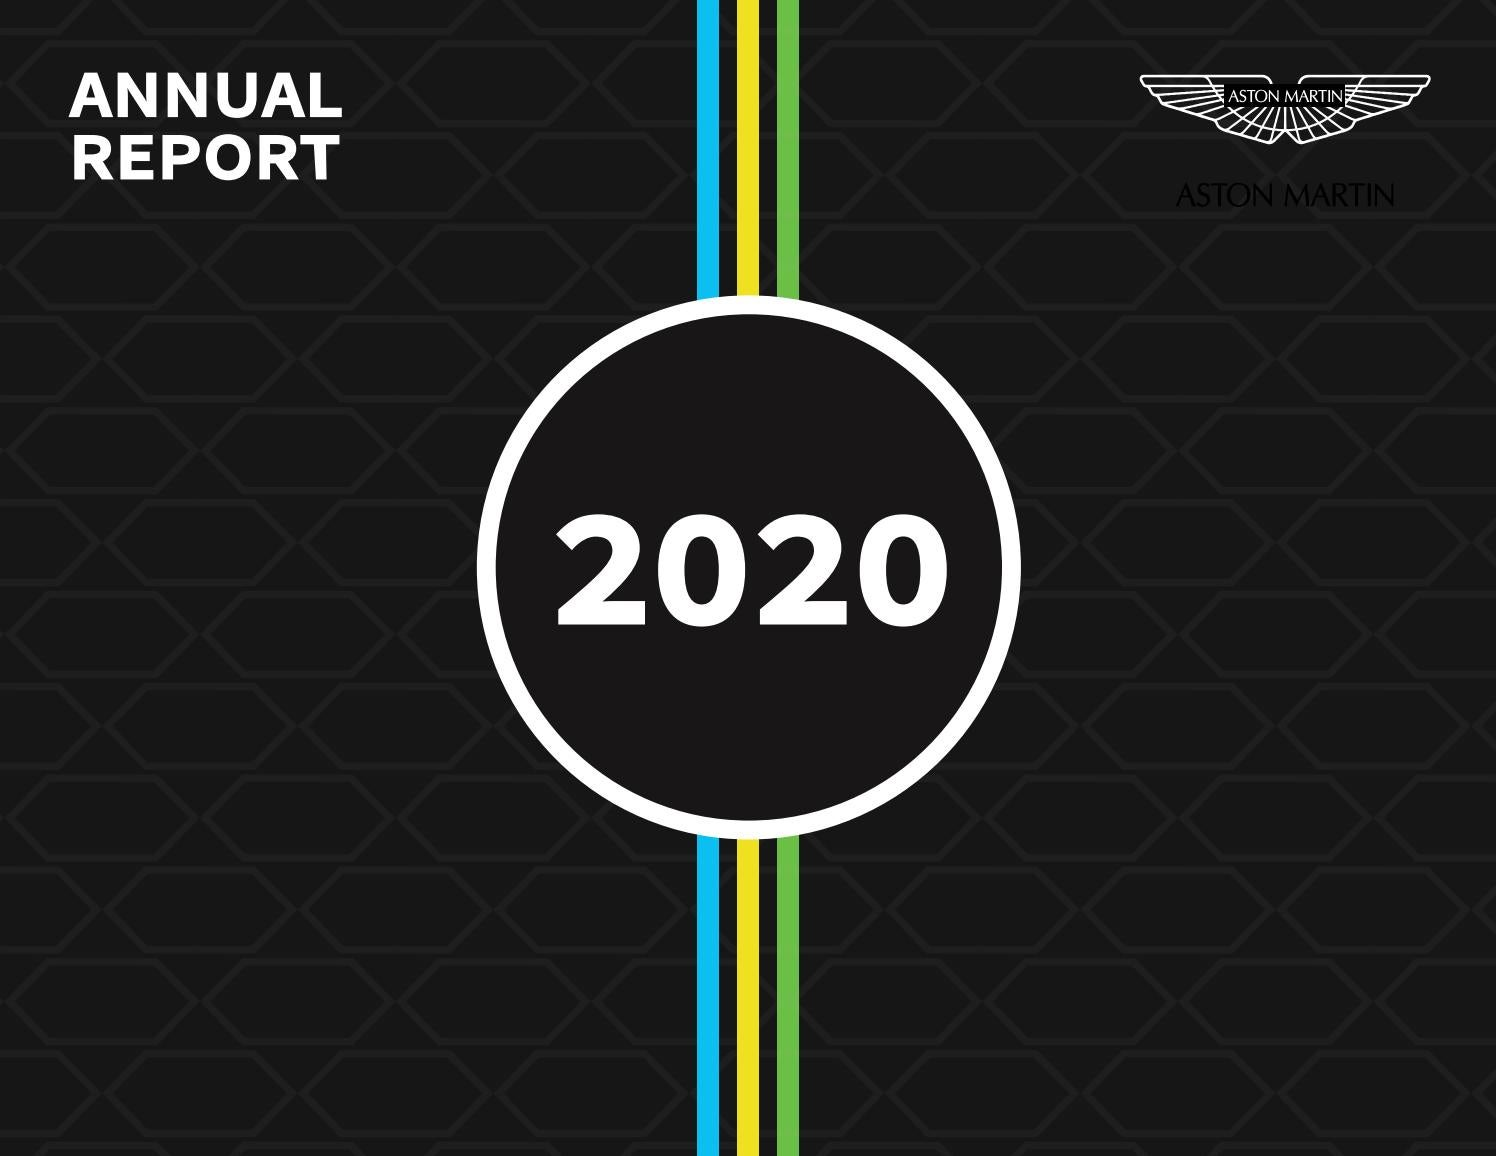 Aston Martin Annual Report By Samuel Scheib Issuu